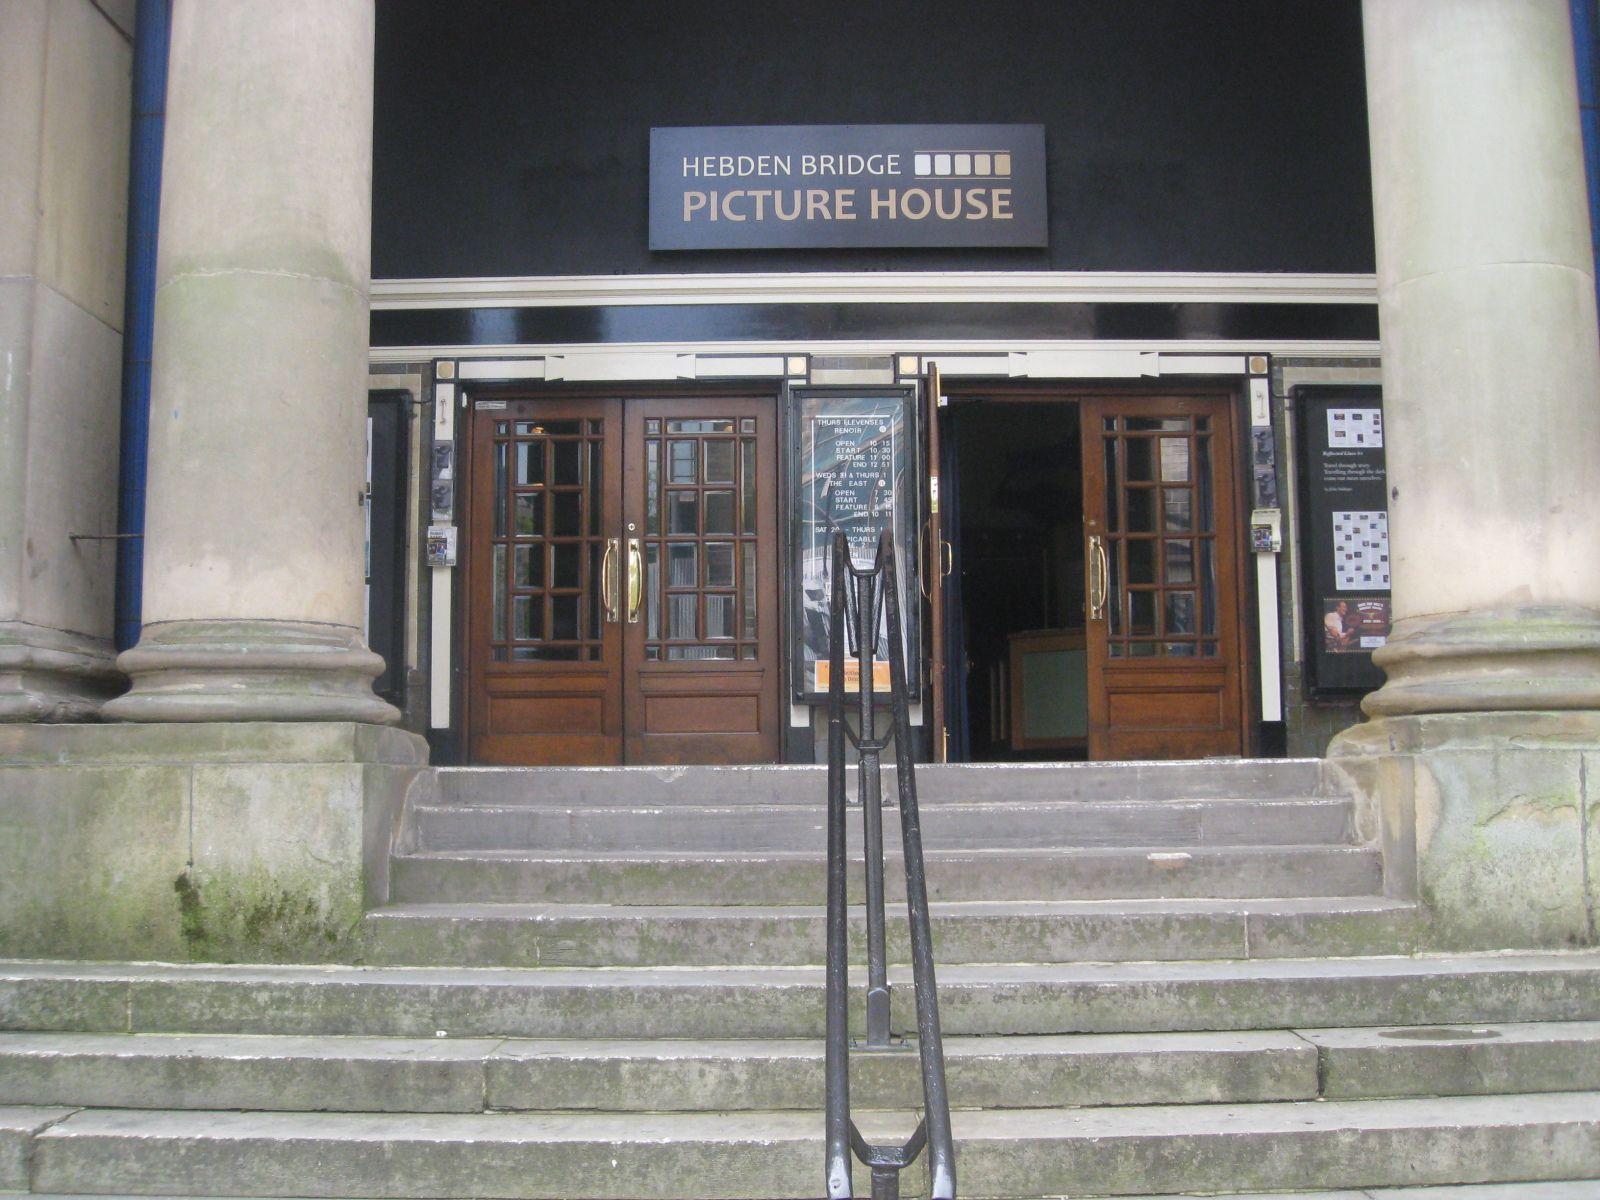 Hebden Bridge Picture House